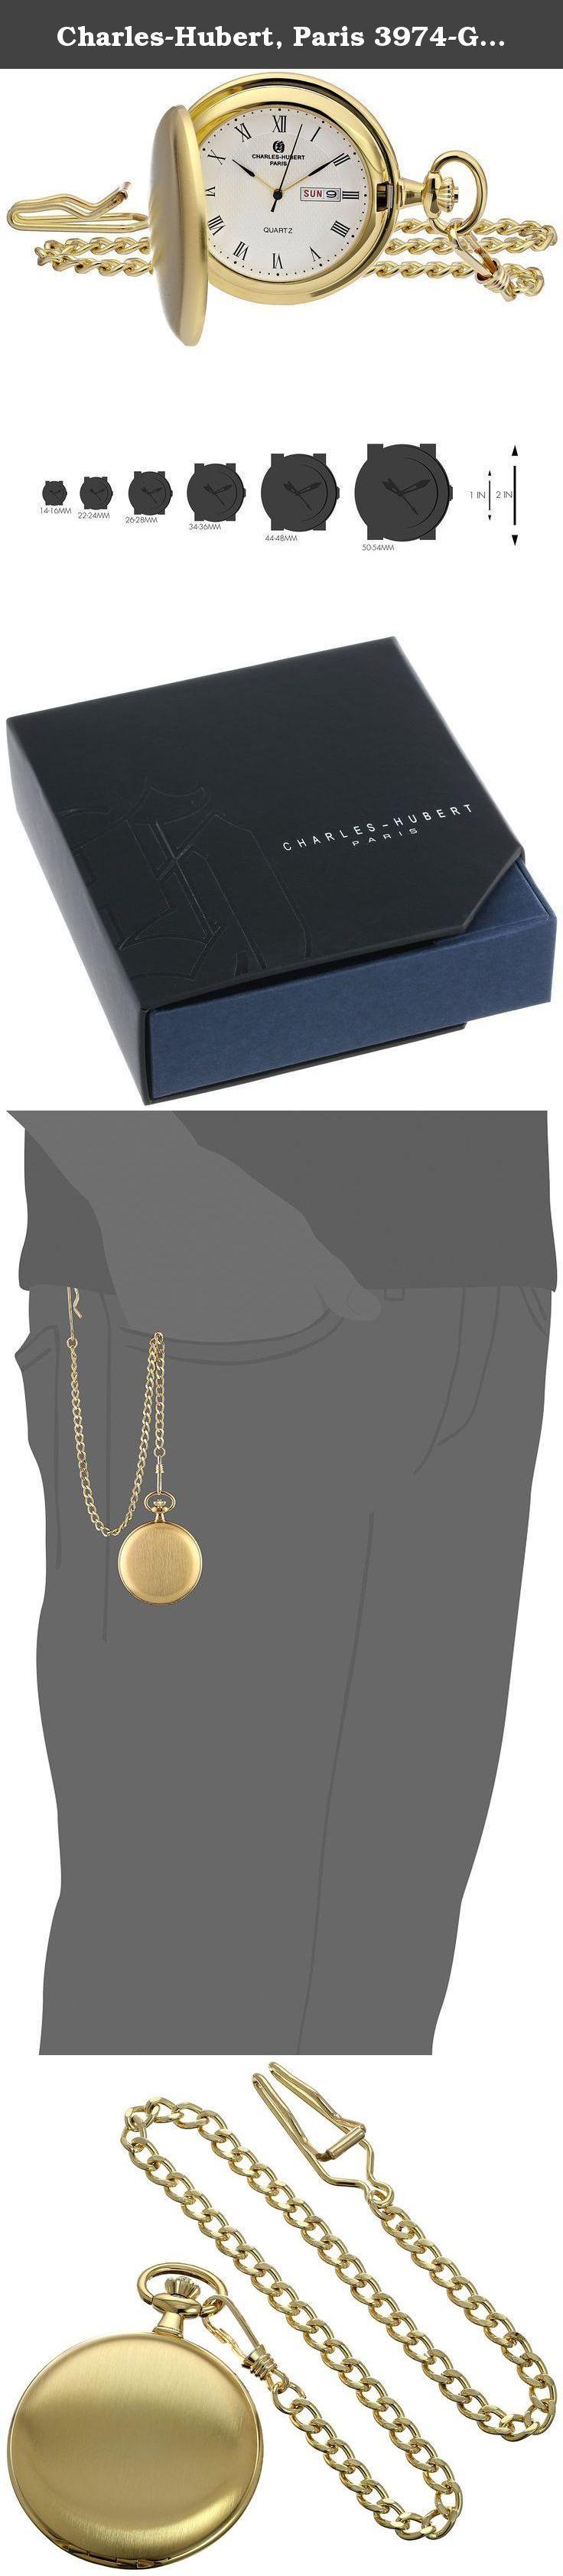 Charles-Hubert, Paris 3974-G Classic Collection Analog Display Japanese Quartz Pocket Watch. Satin finish hunter case. Day and date window. Japanese-quartz Movement. Case Diameter: 47mm. Not Water Resistant.